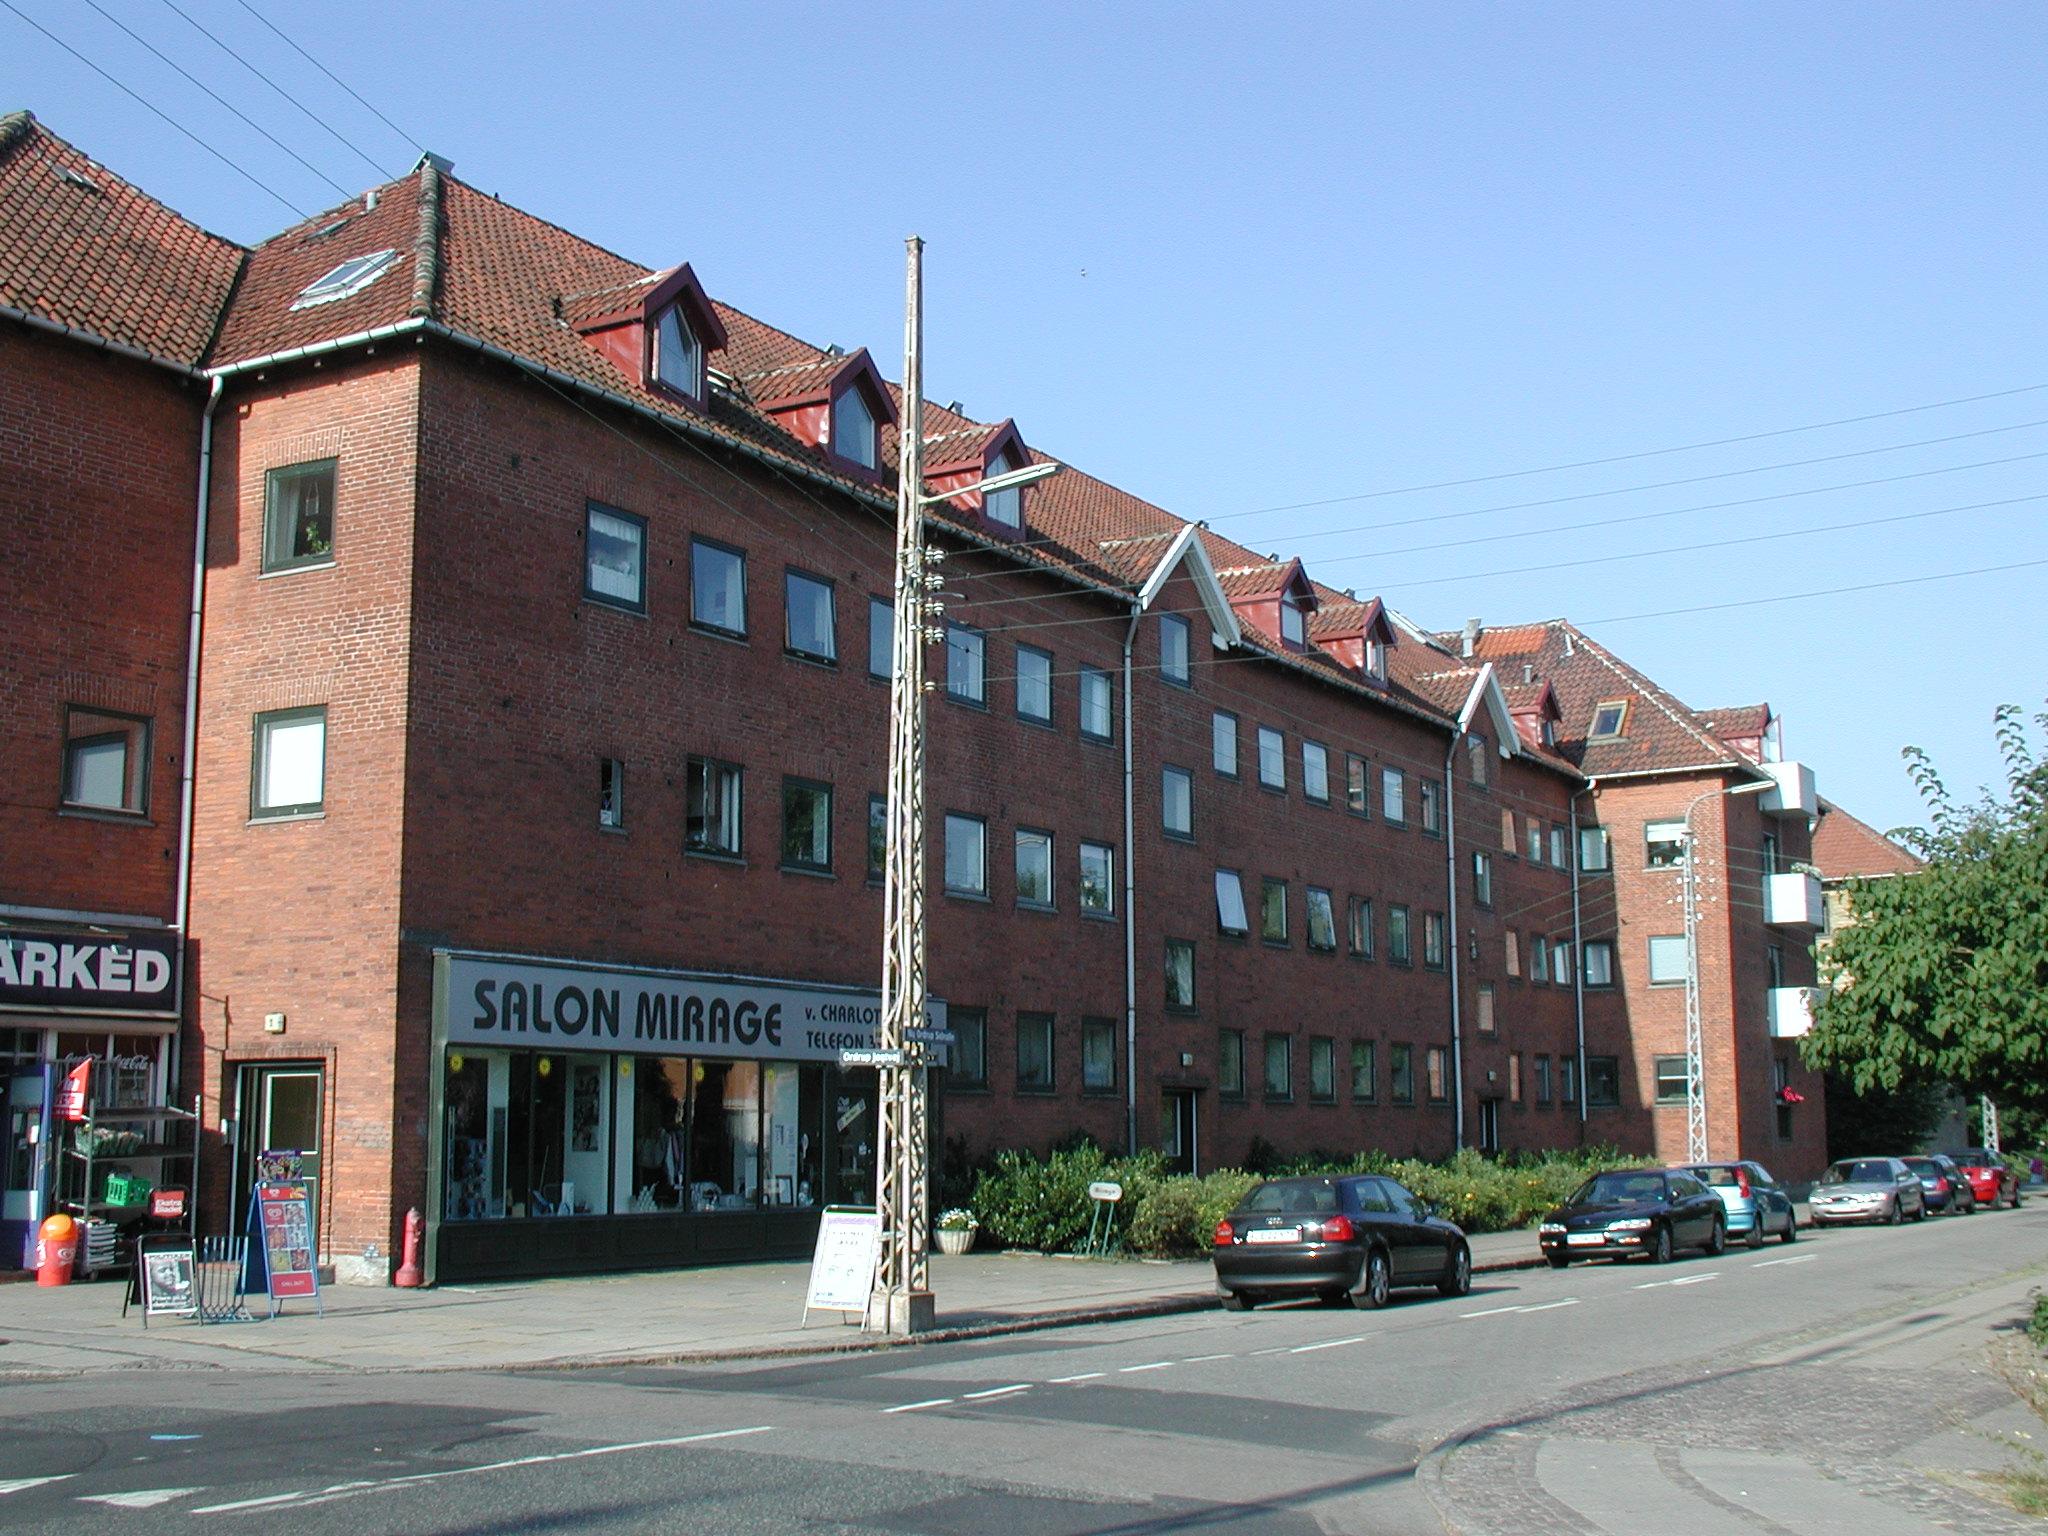 Billig boligadvokat – Få 3 gratis tilbud